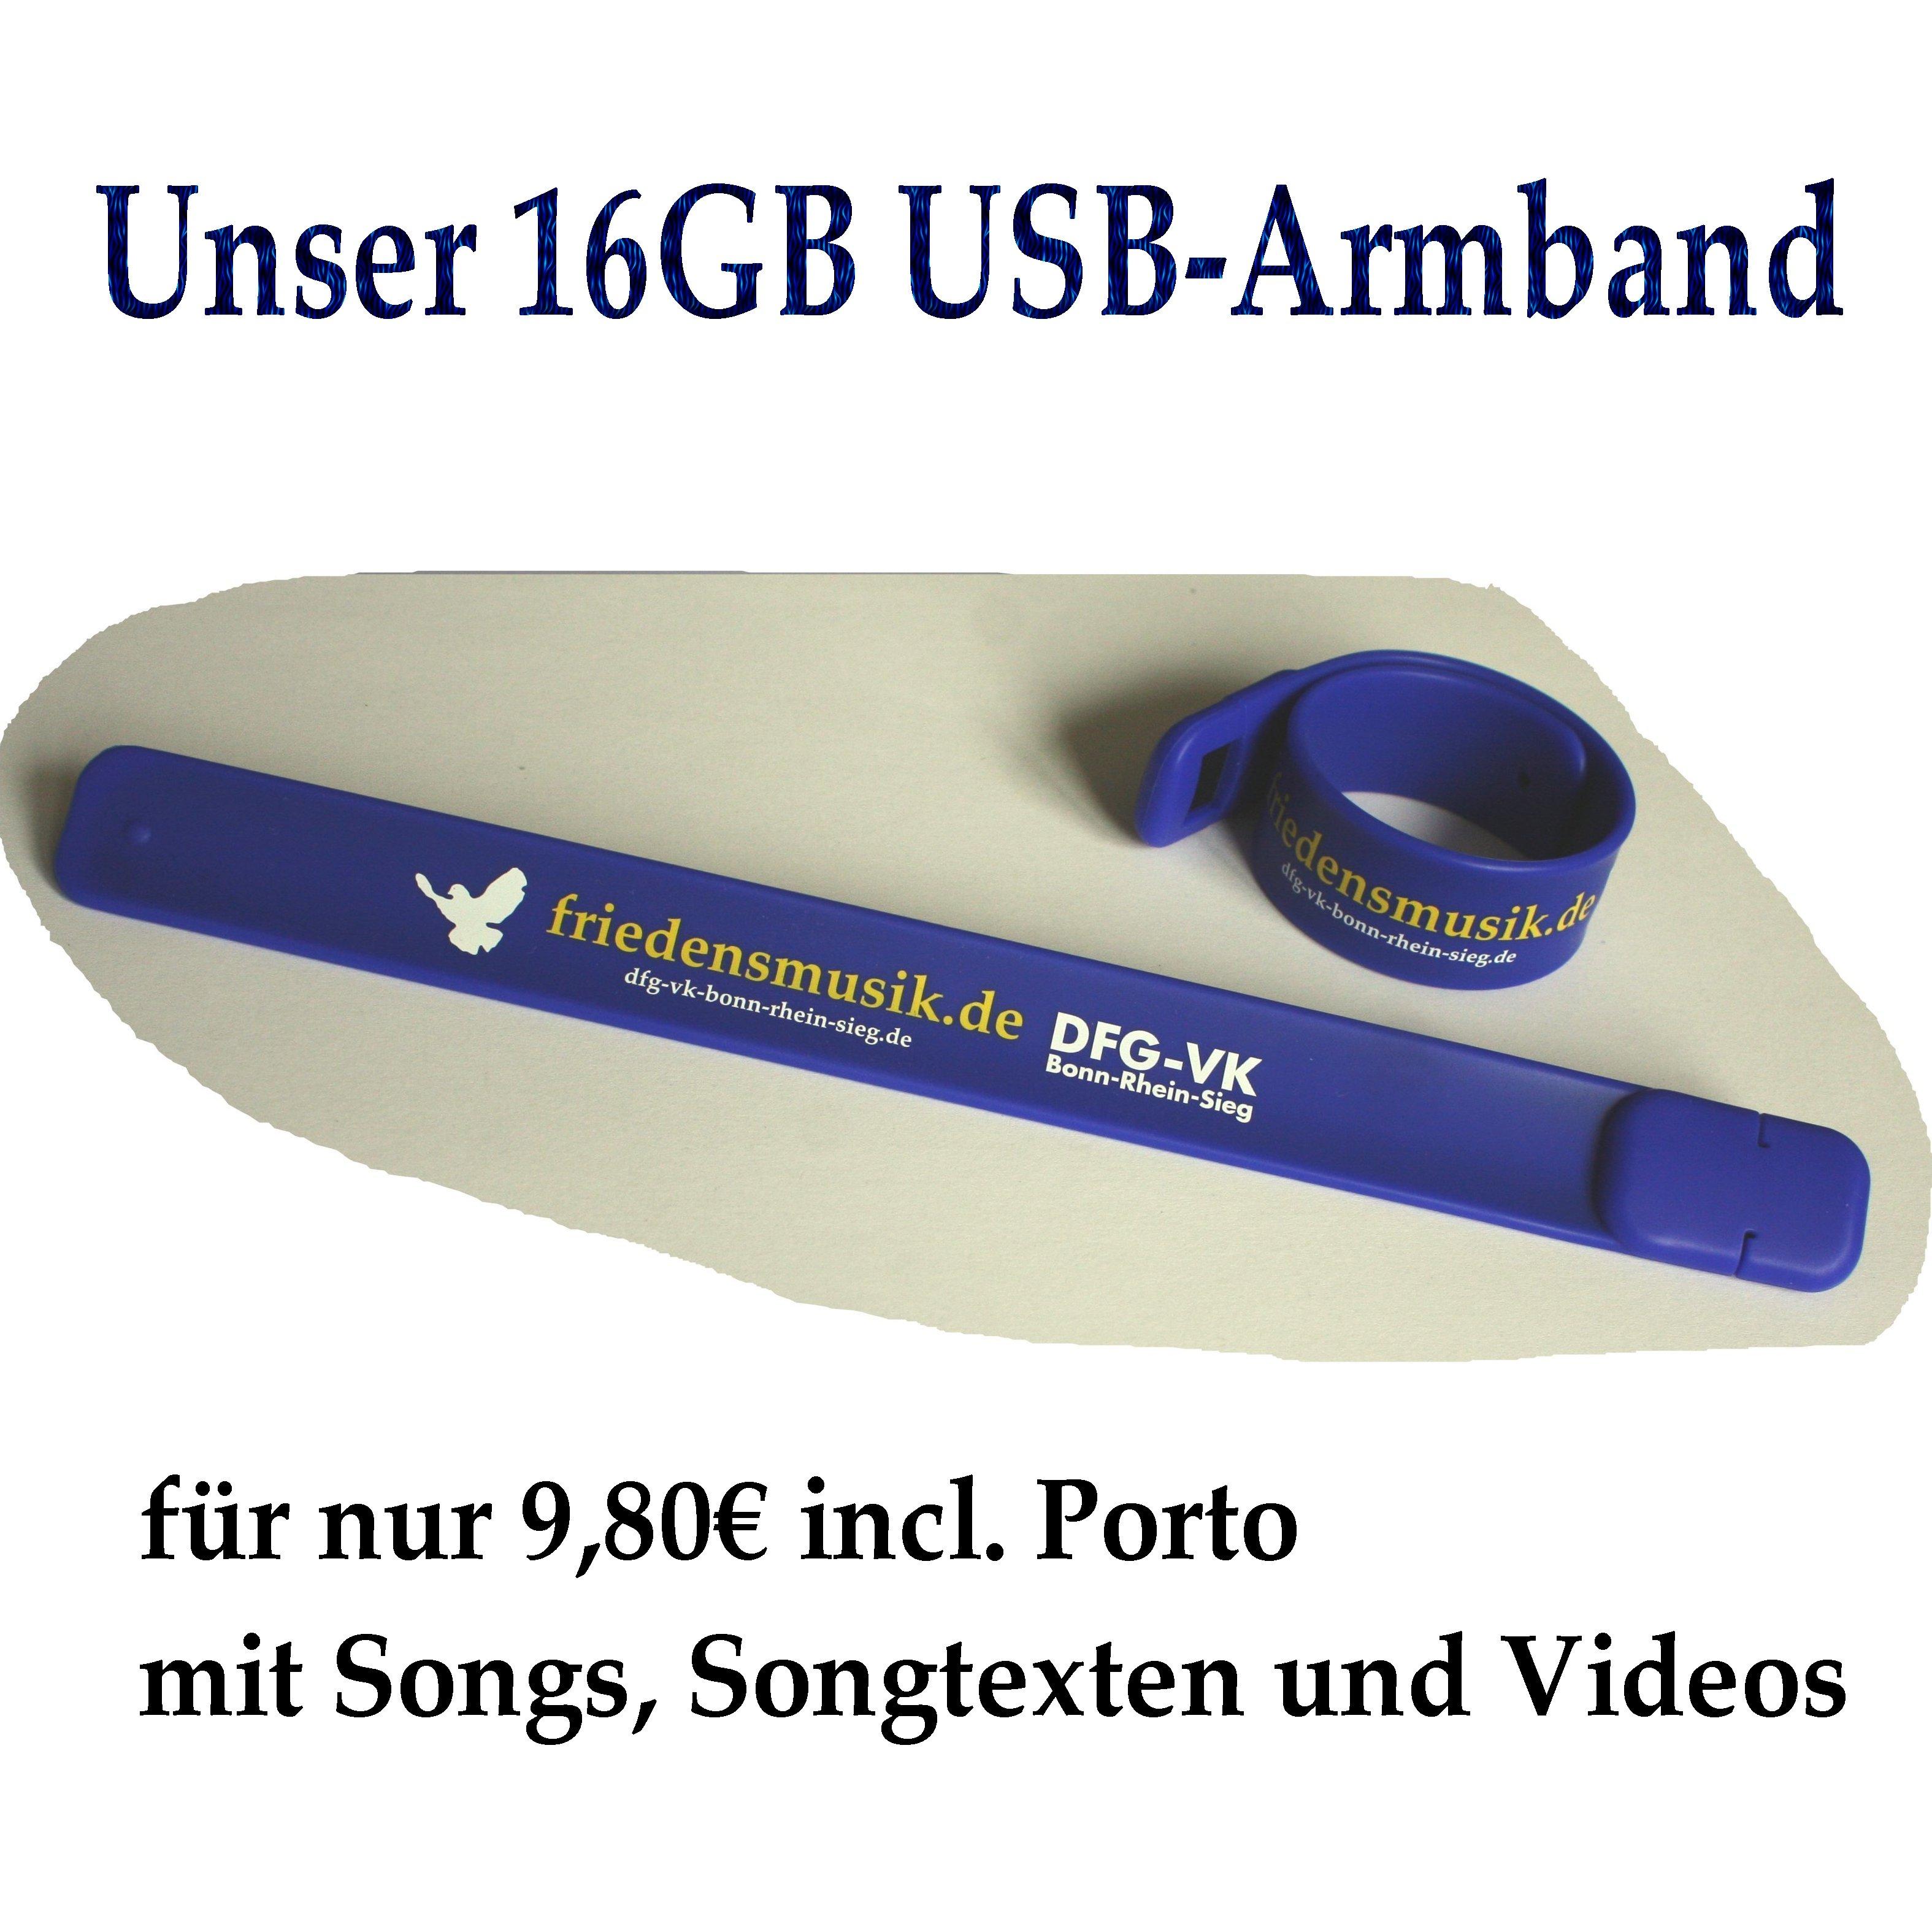 16GB USB-Armband